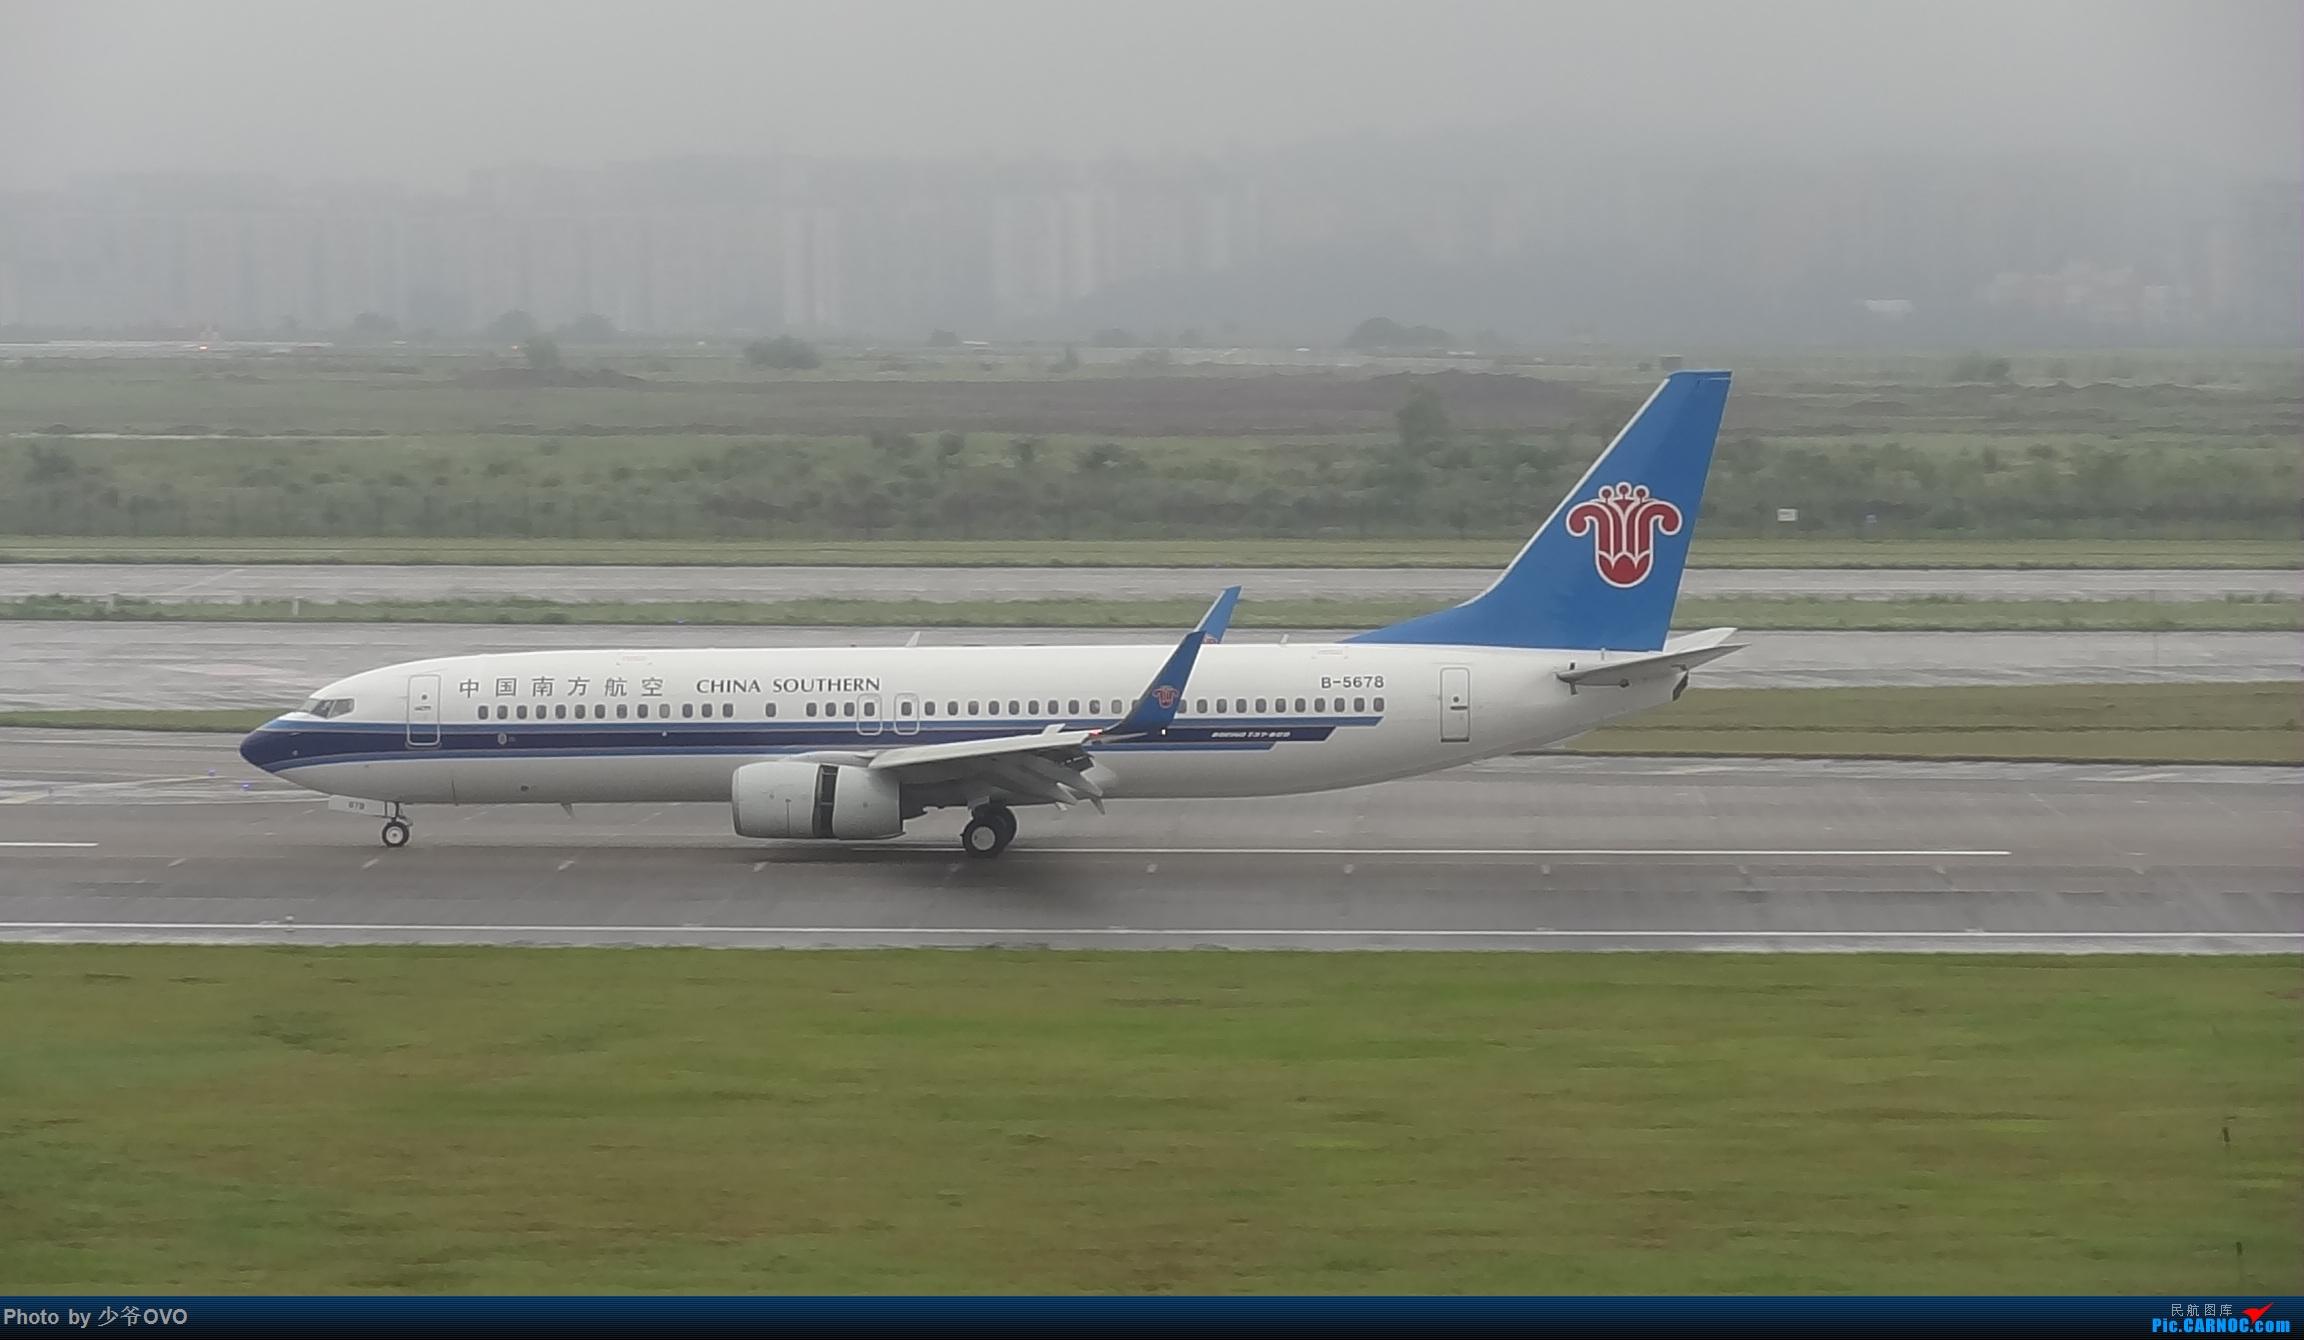 Re:[原创]CKG重庆江北机场拍机 ,中法建交50周年 BOEING 737-800 B-5678 中国重庆江北国际机场